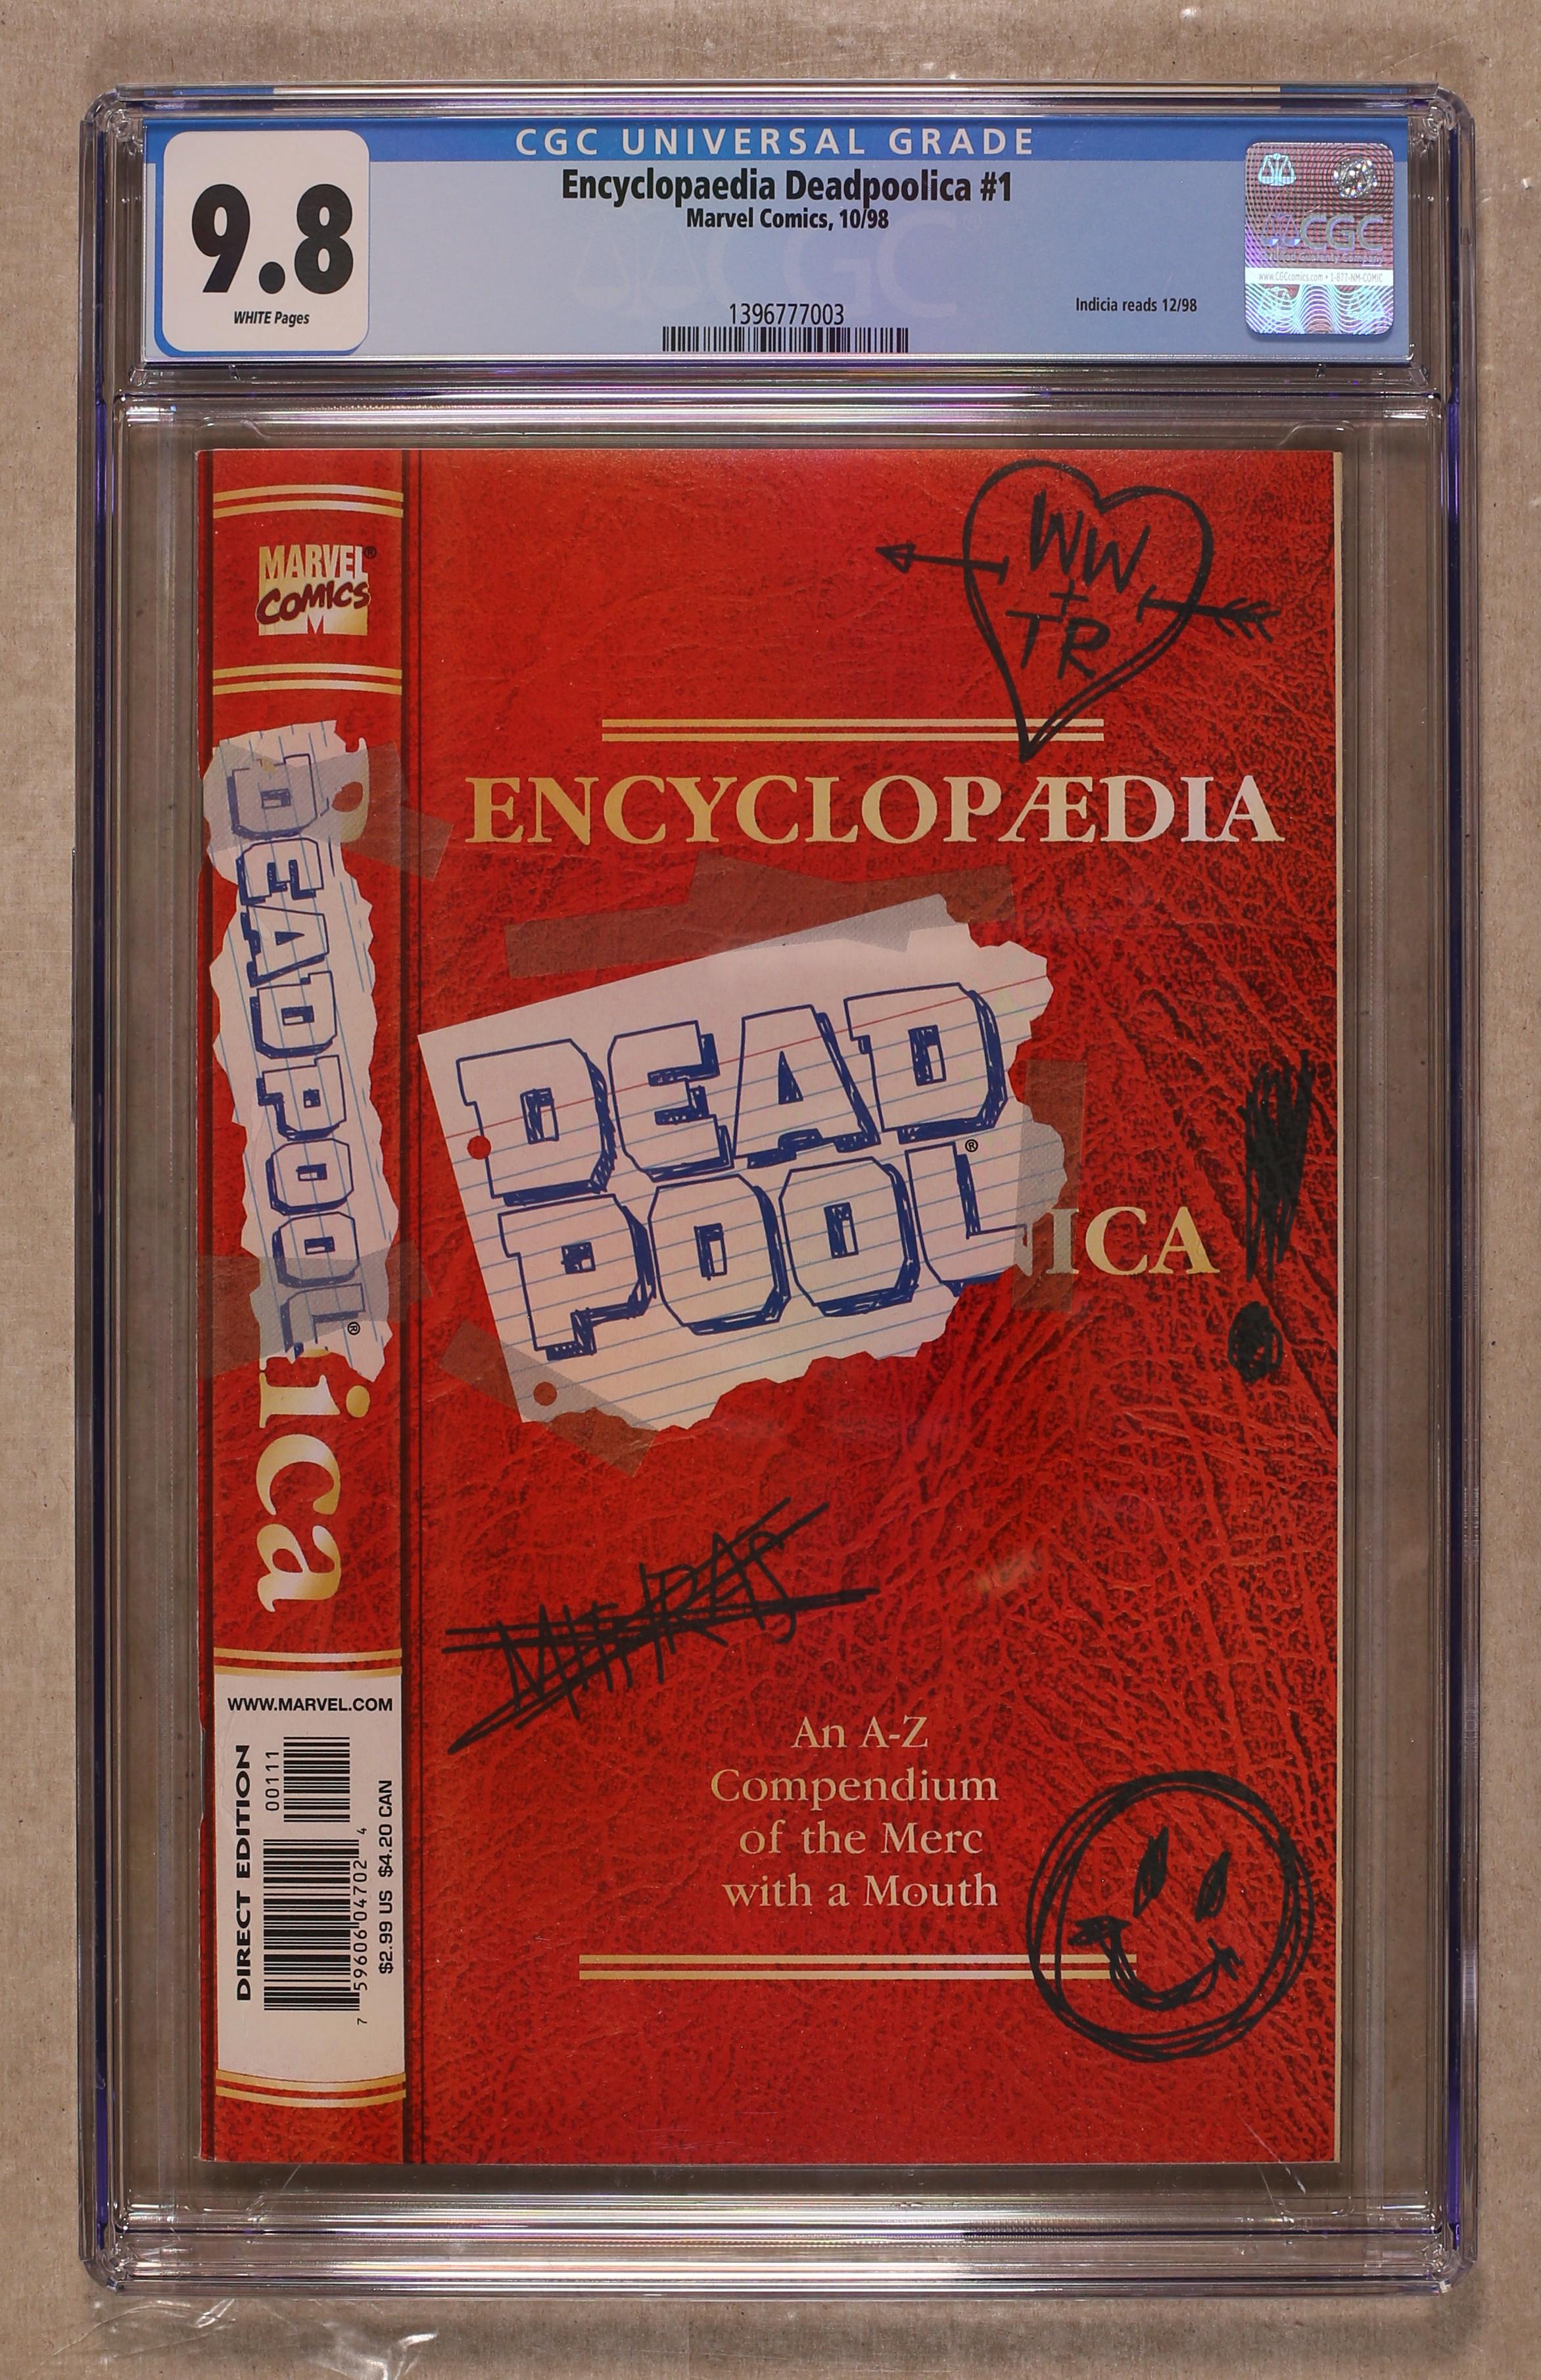 encyclopedia deadpoolica